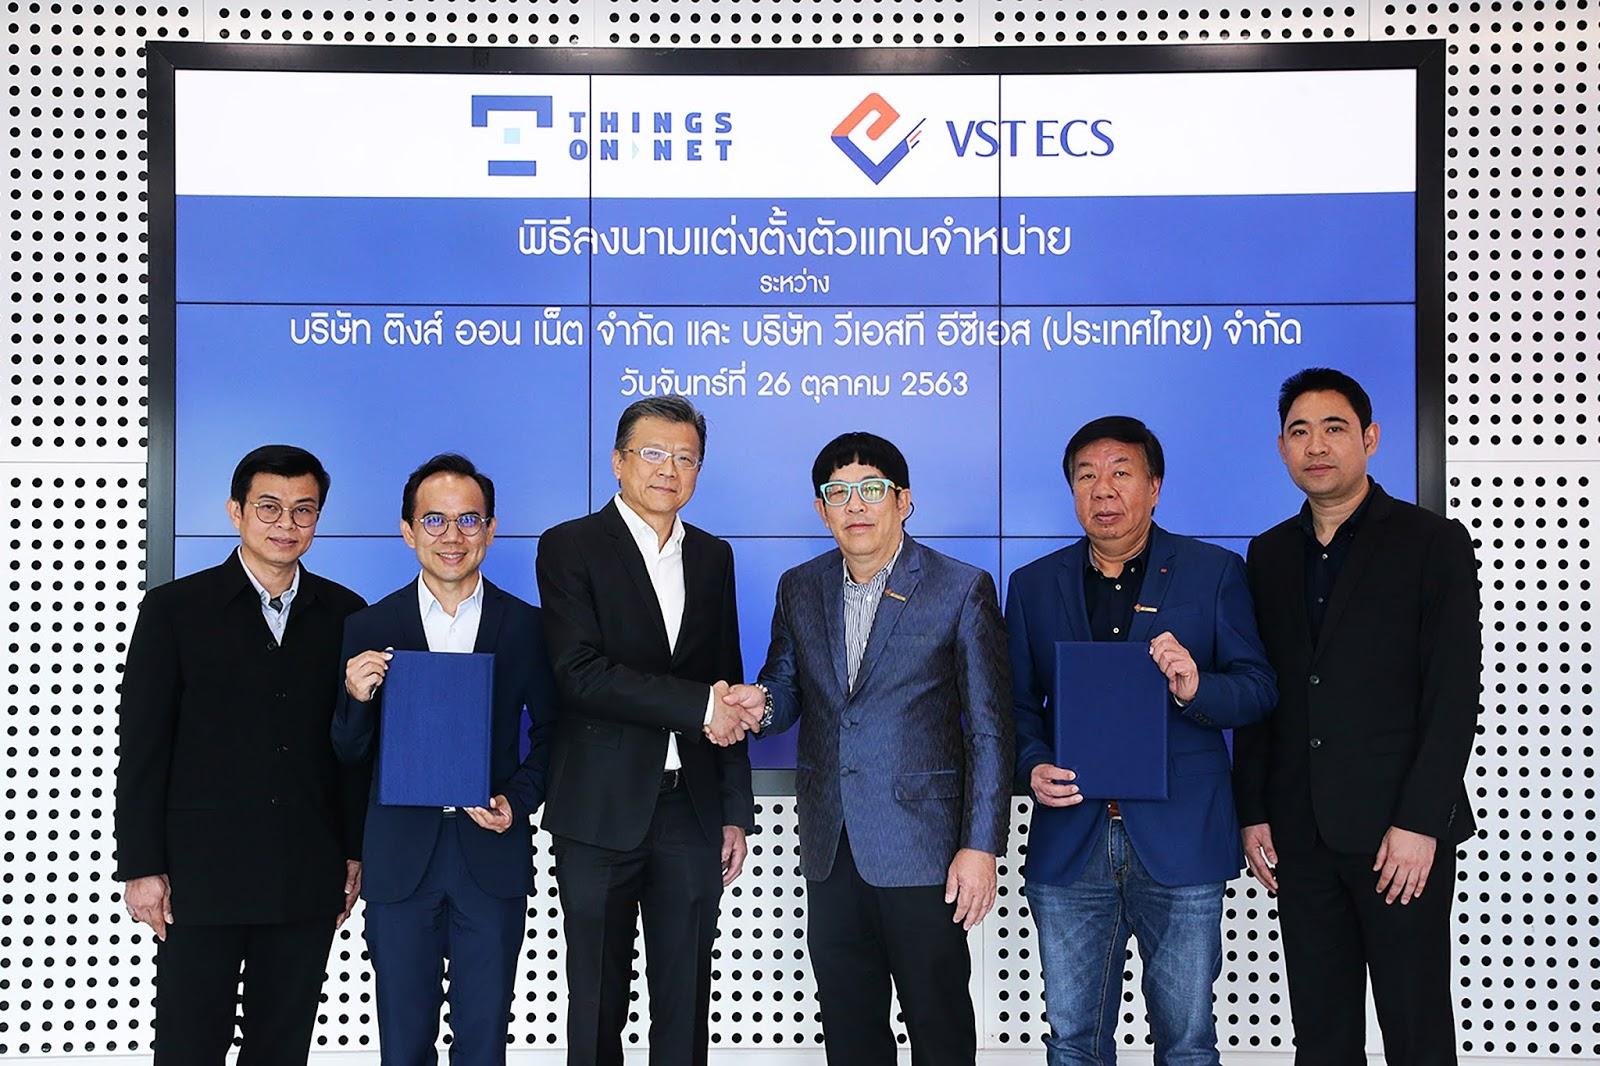 Things on Net และ VST ECS ร่วมลงนามเซ็นสัญญาแต่งตั้งตัวแทนจำหน่าย IoT solutions อย่างเป็นทางการในประเทศไทย